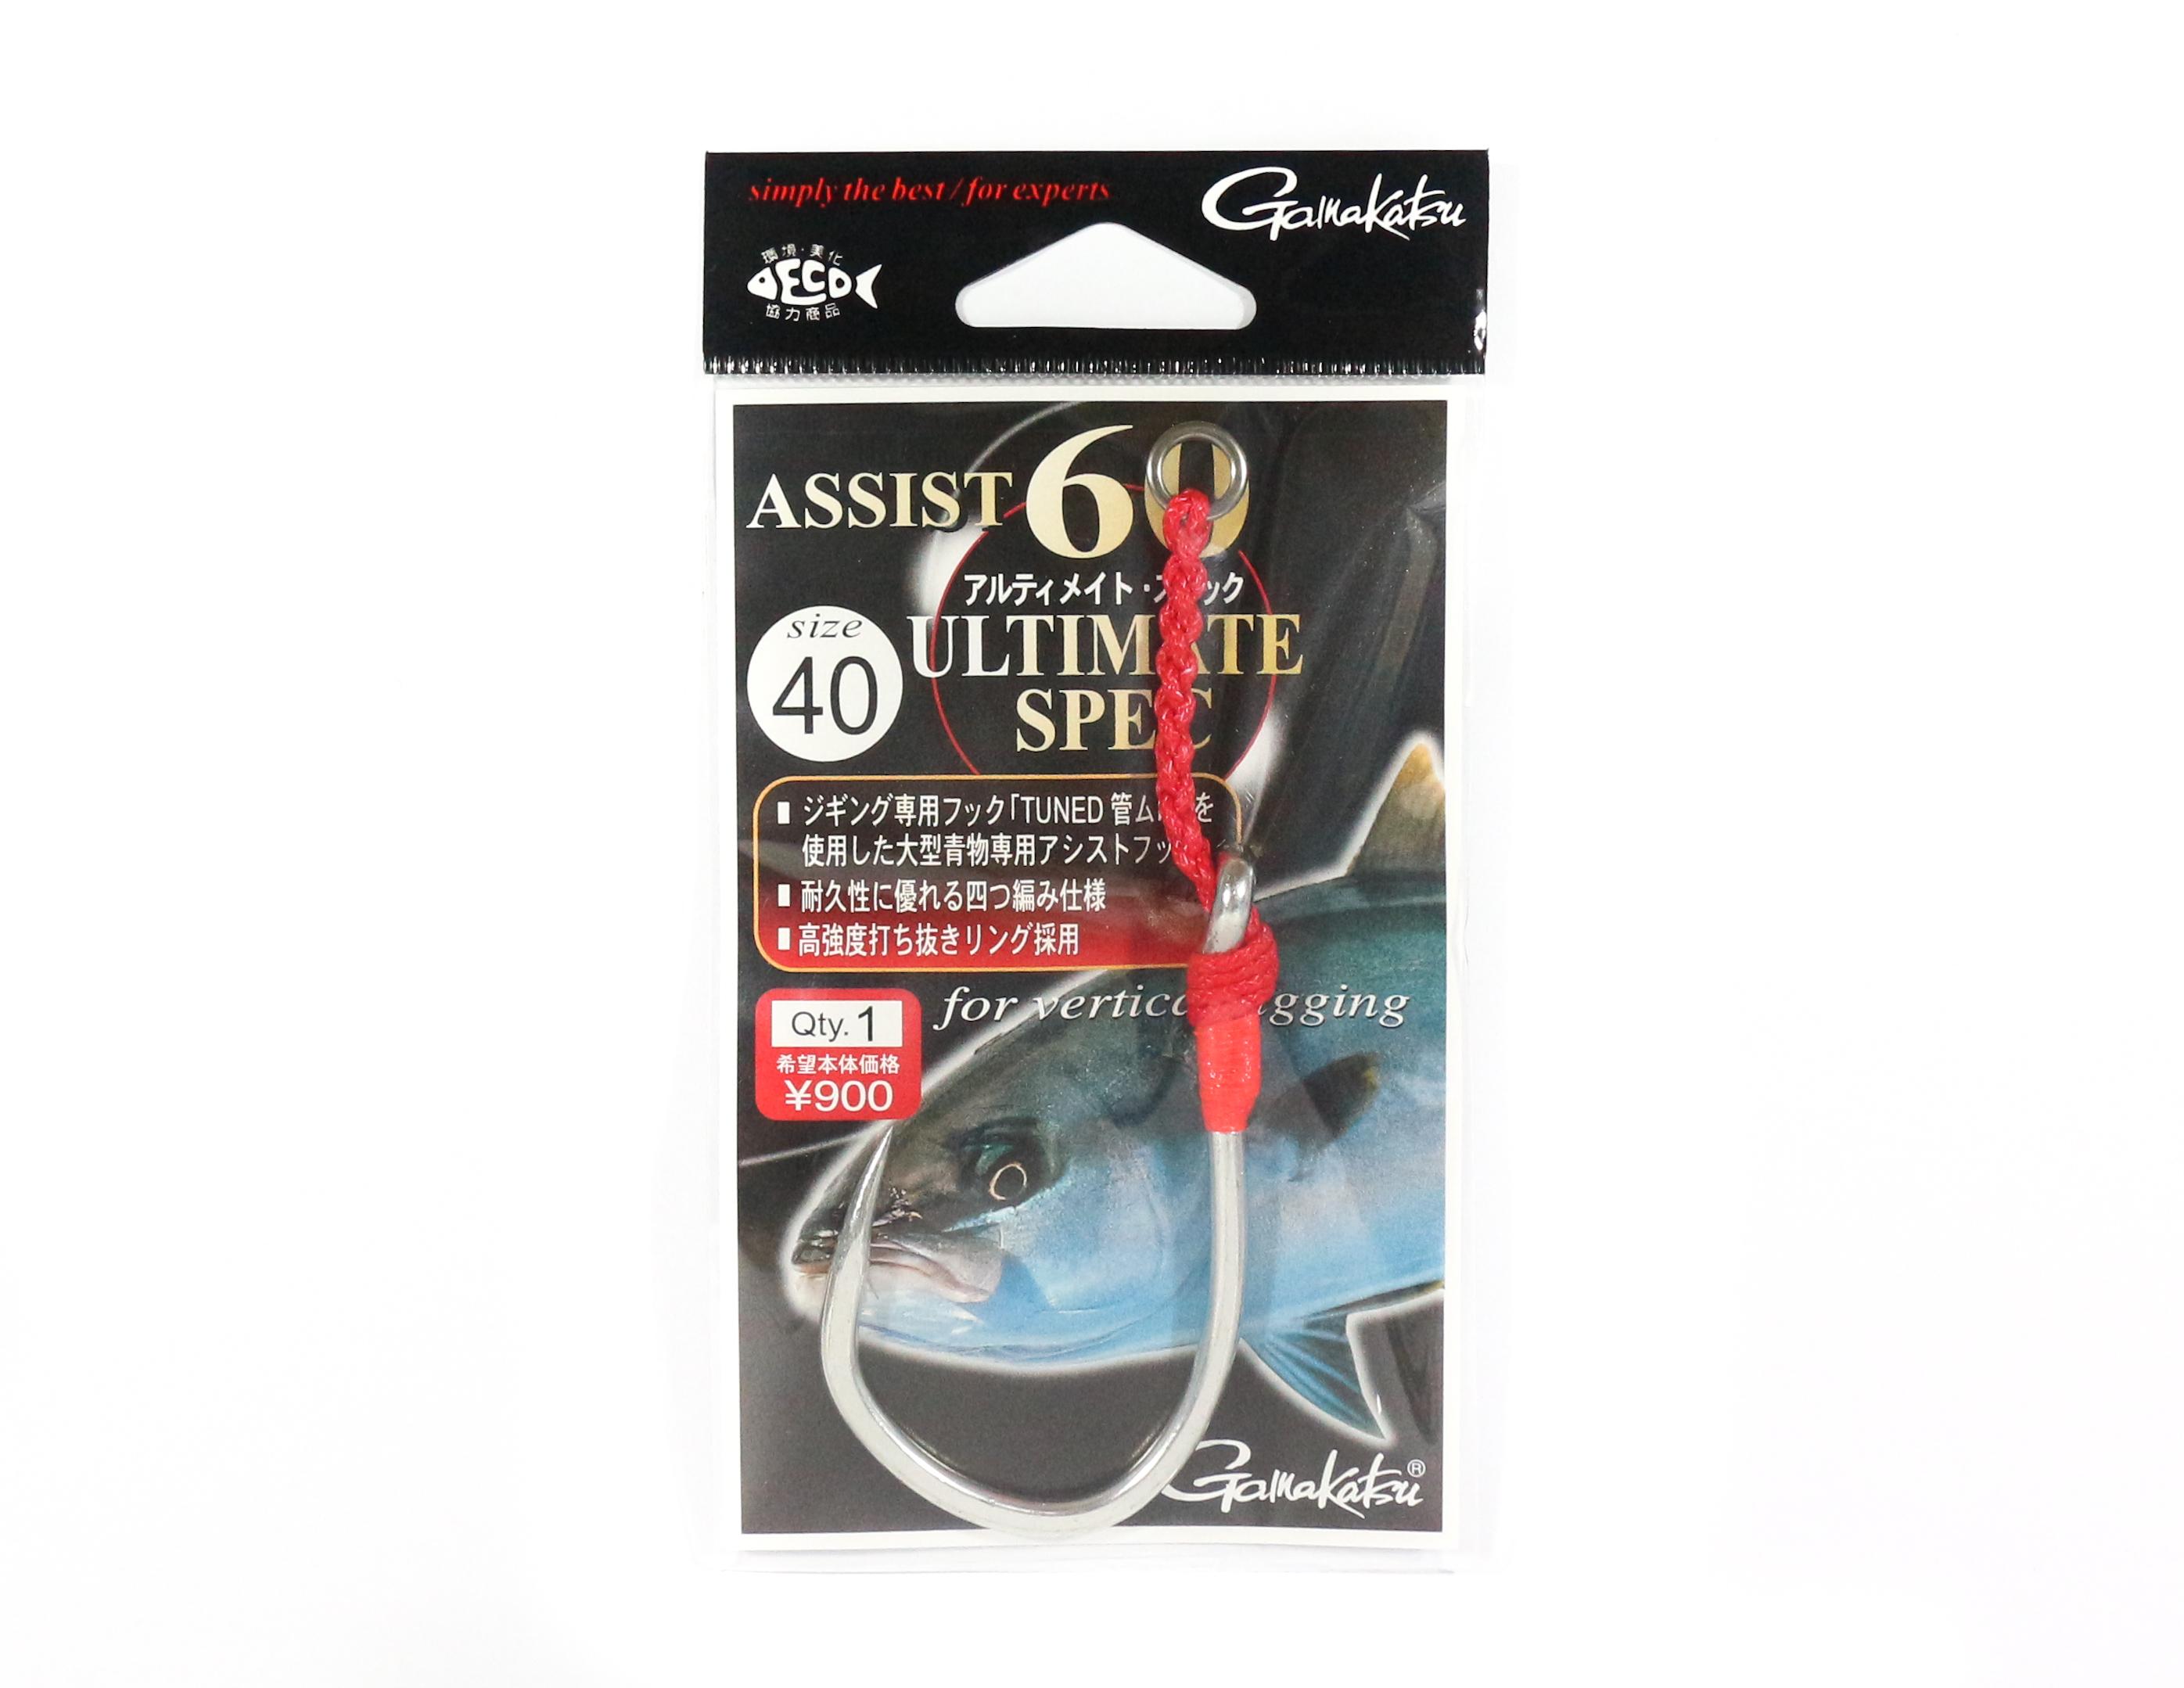 Sale Gamakatsu Assist 60 Ultimate Spec Assist Hook Size 40 (3777)